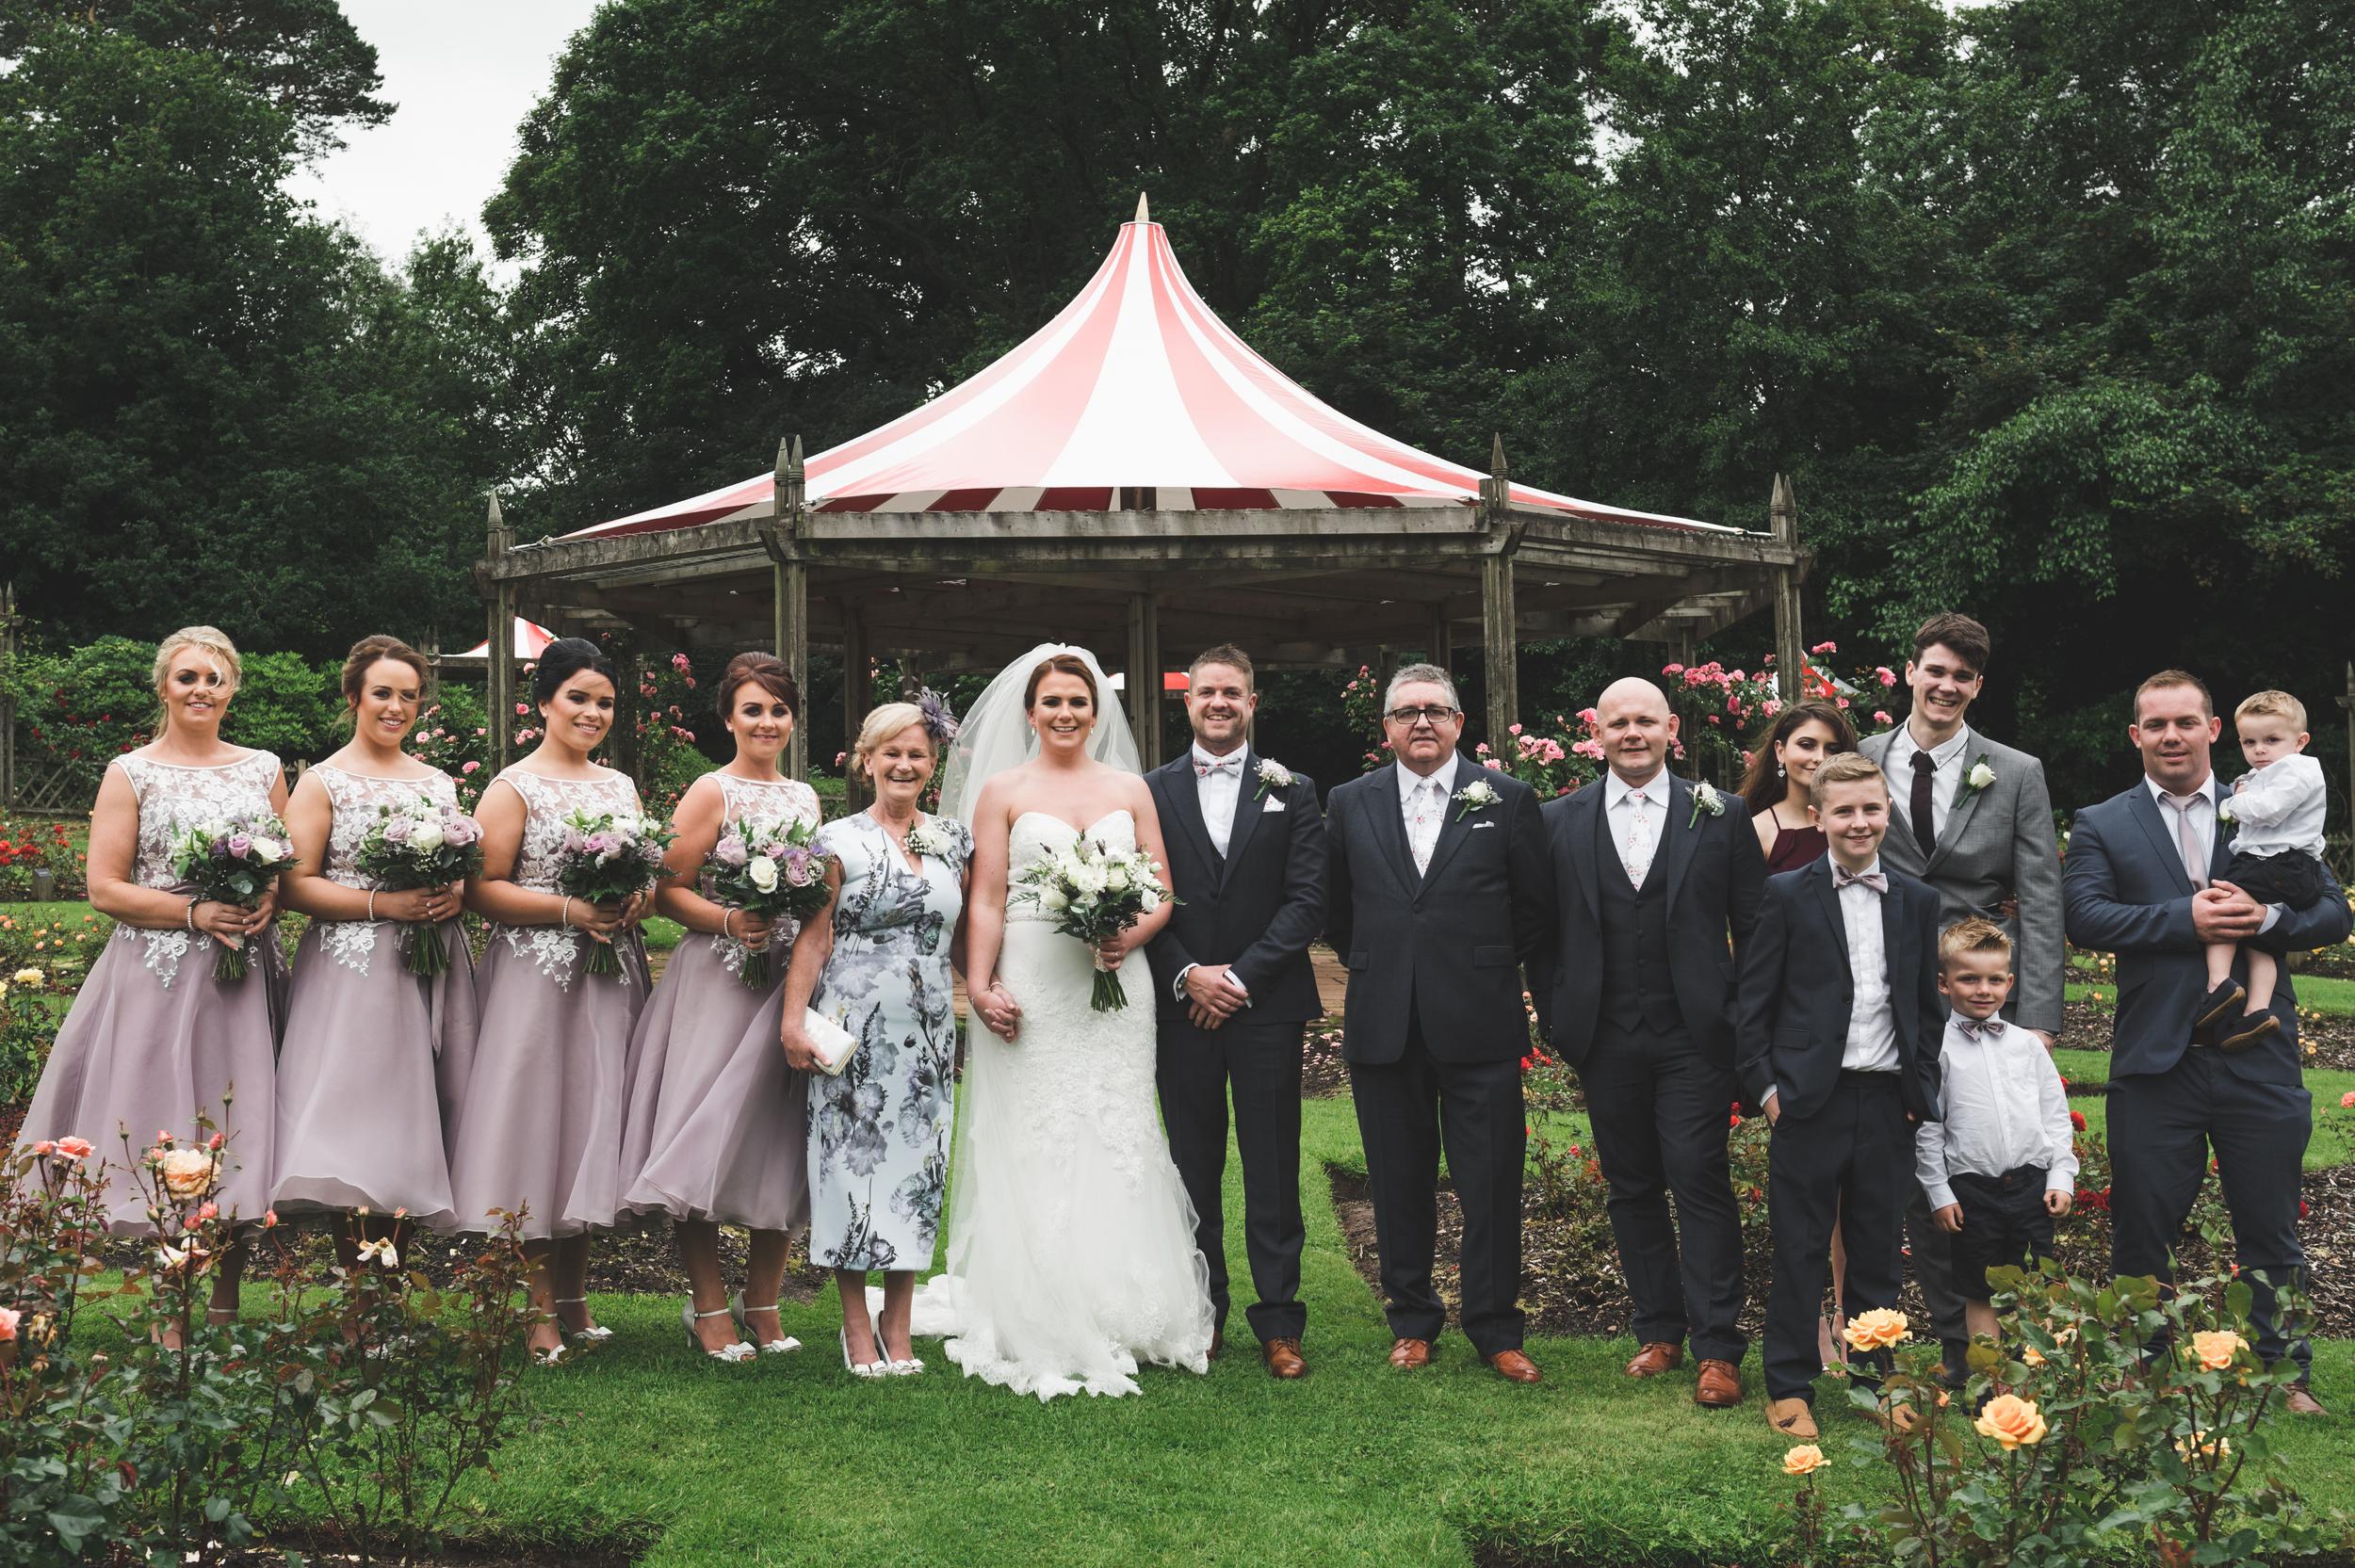 Belfast Wedding Photographer purephotoni lady dixons park bridal party